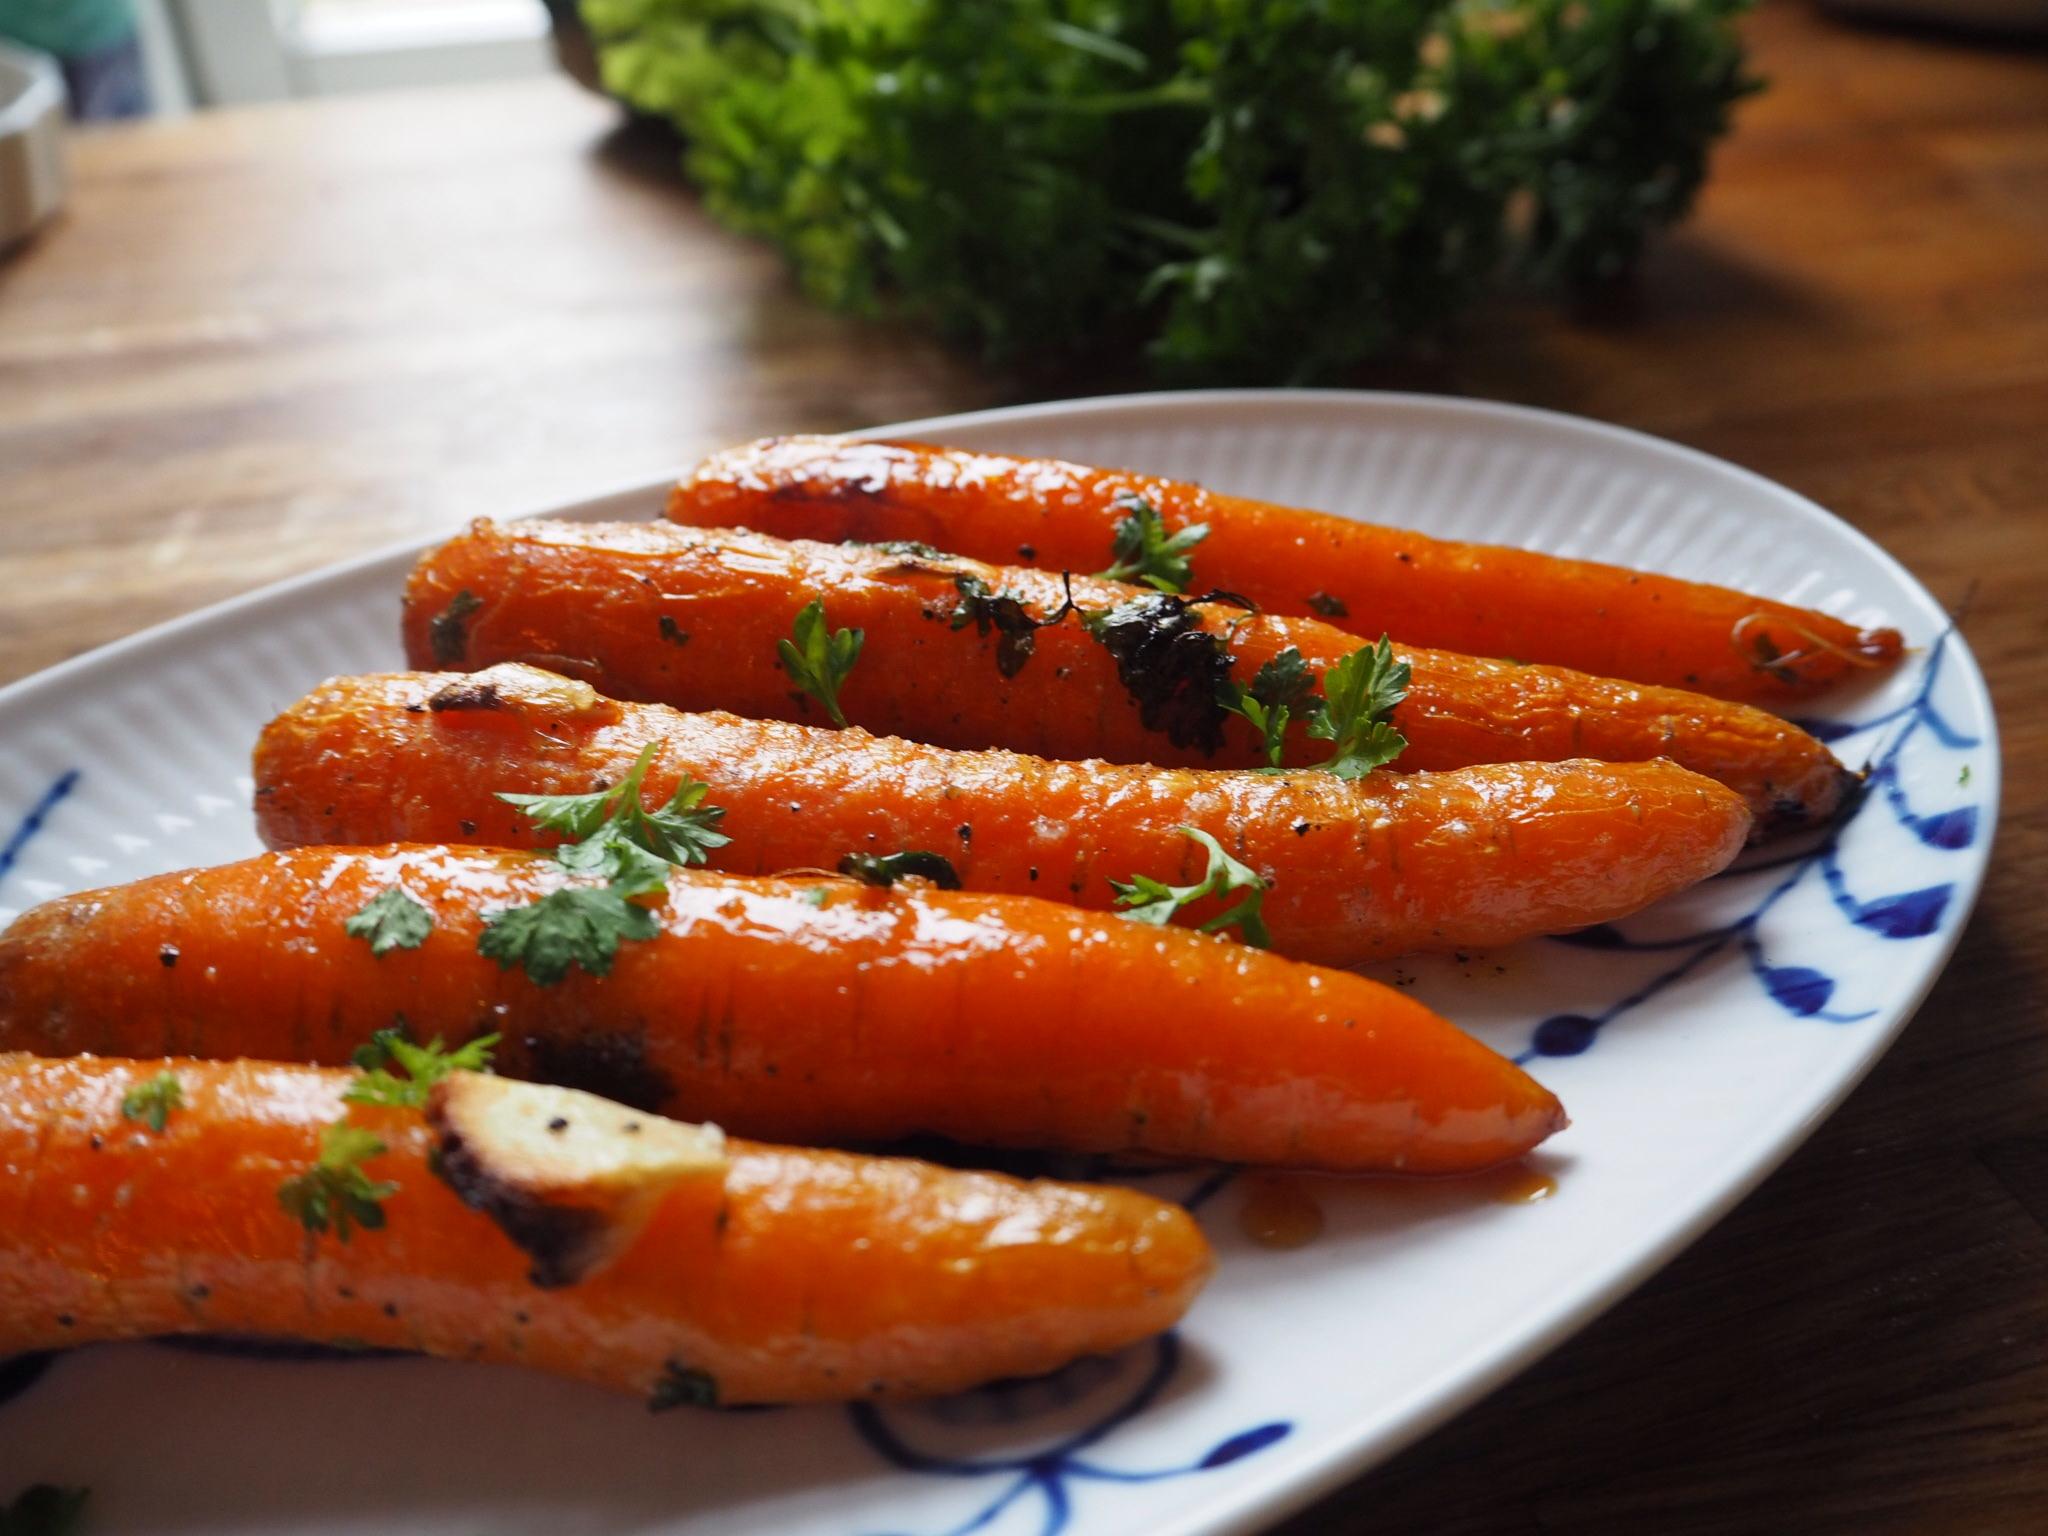 Honningristede gulerødder